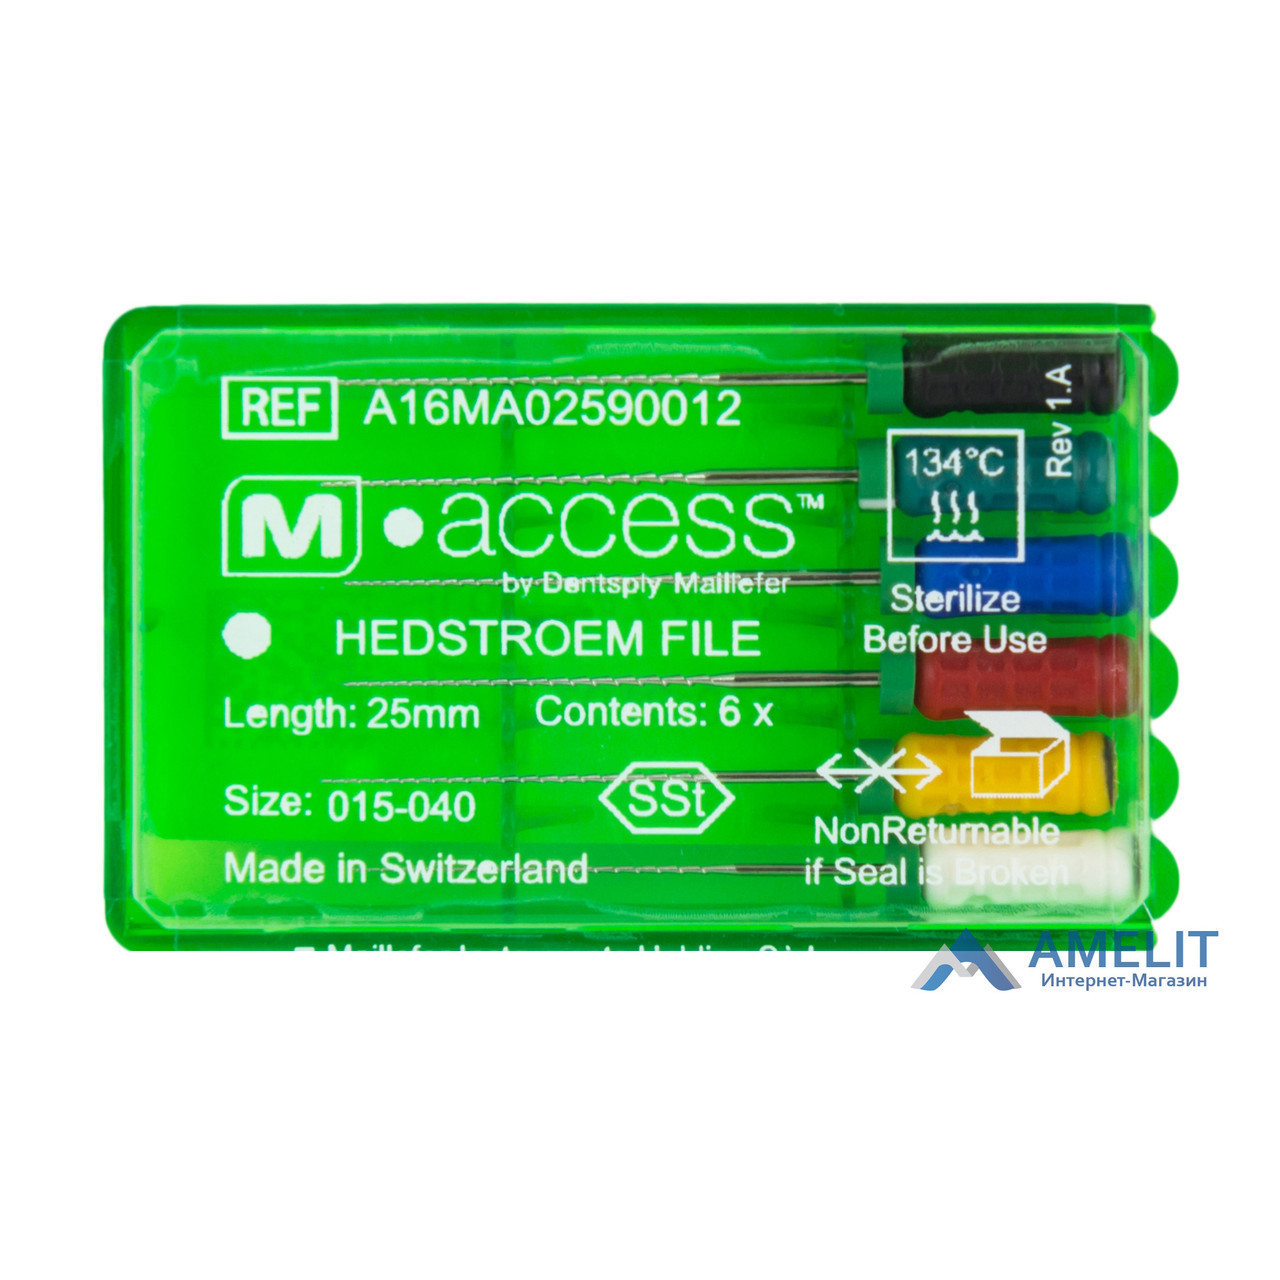 Н-файл M-Access №35 (H-File M-Access, Dentsply Maillefer), 6 шт. /уп.